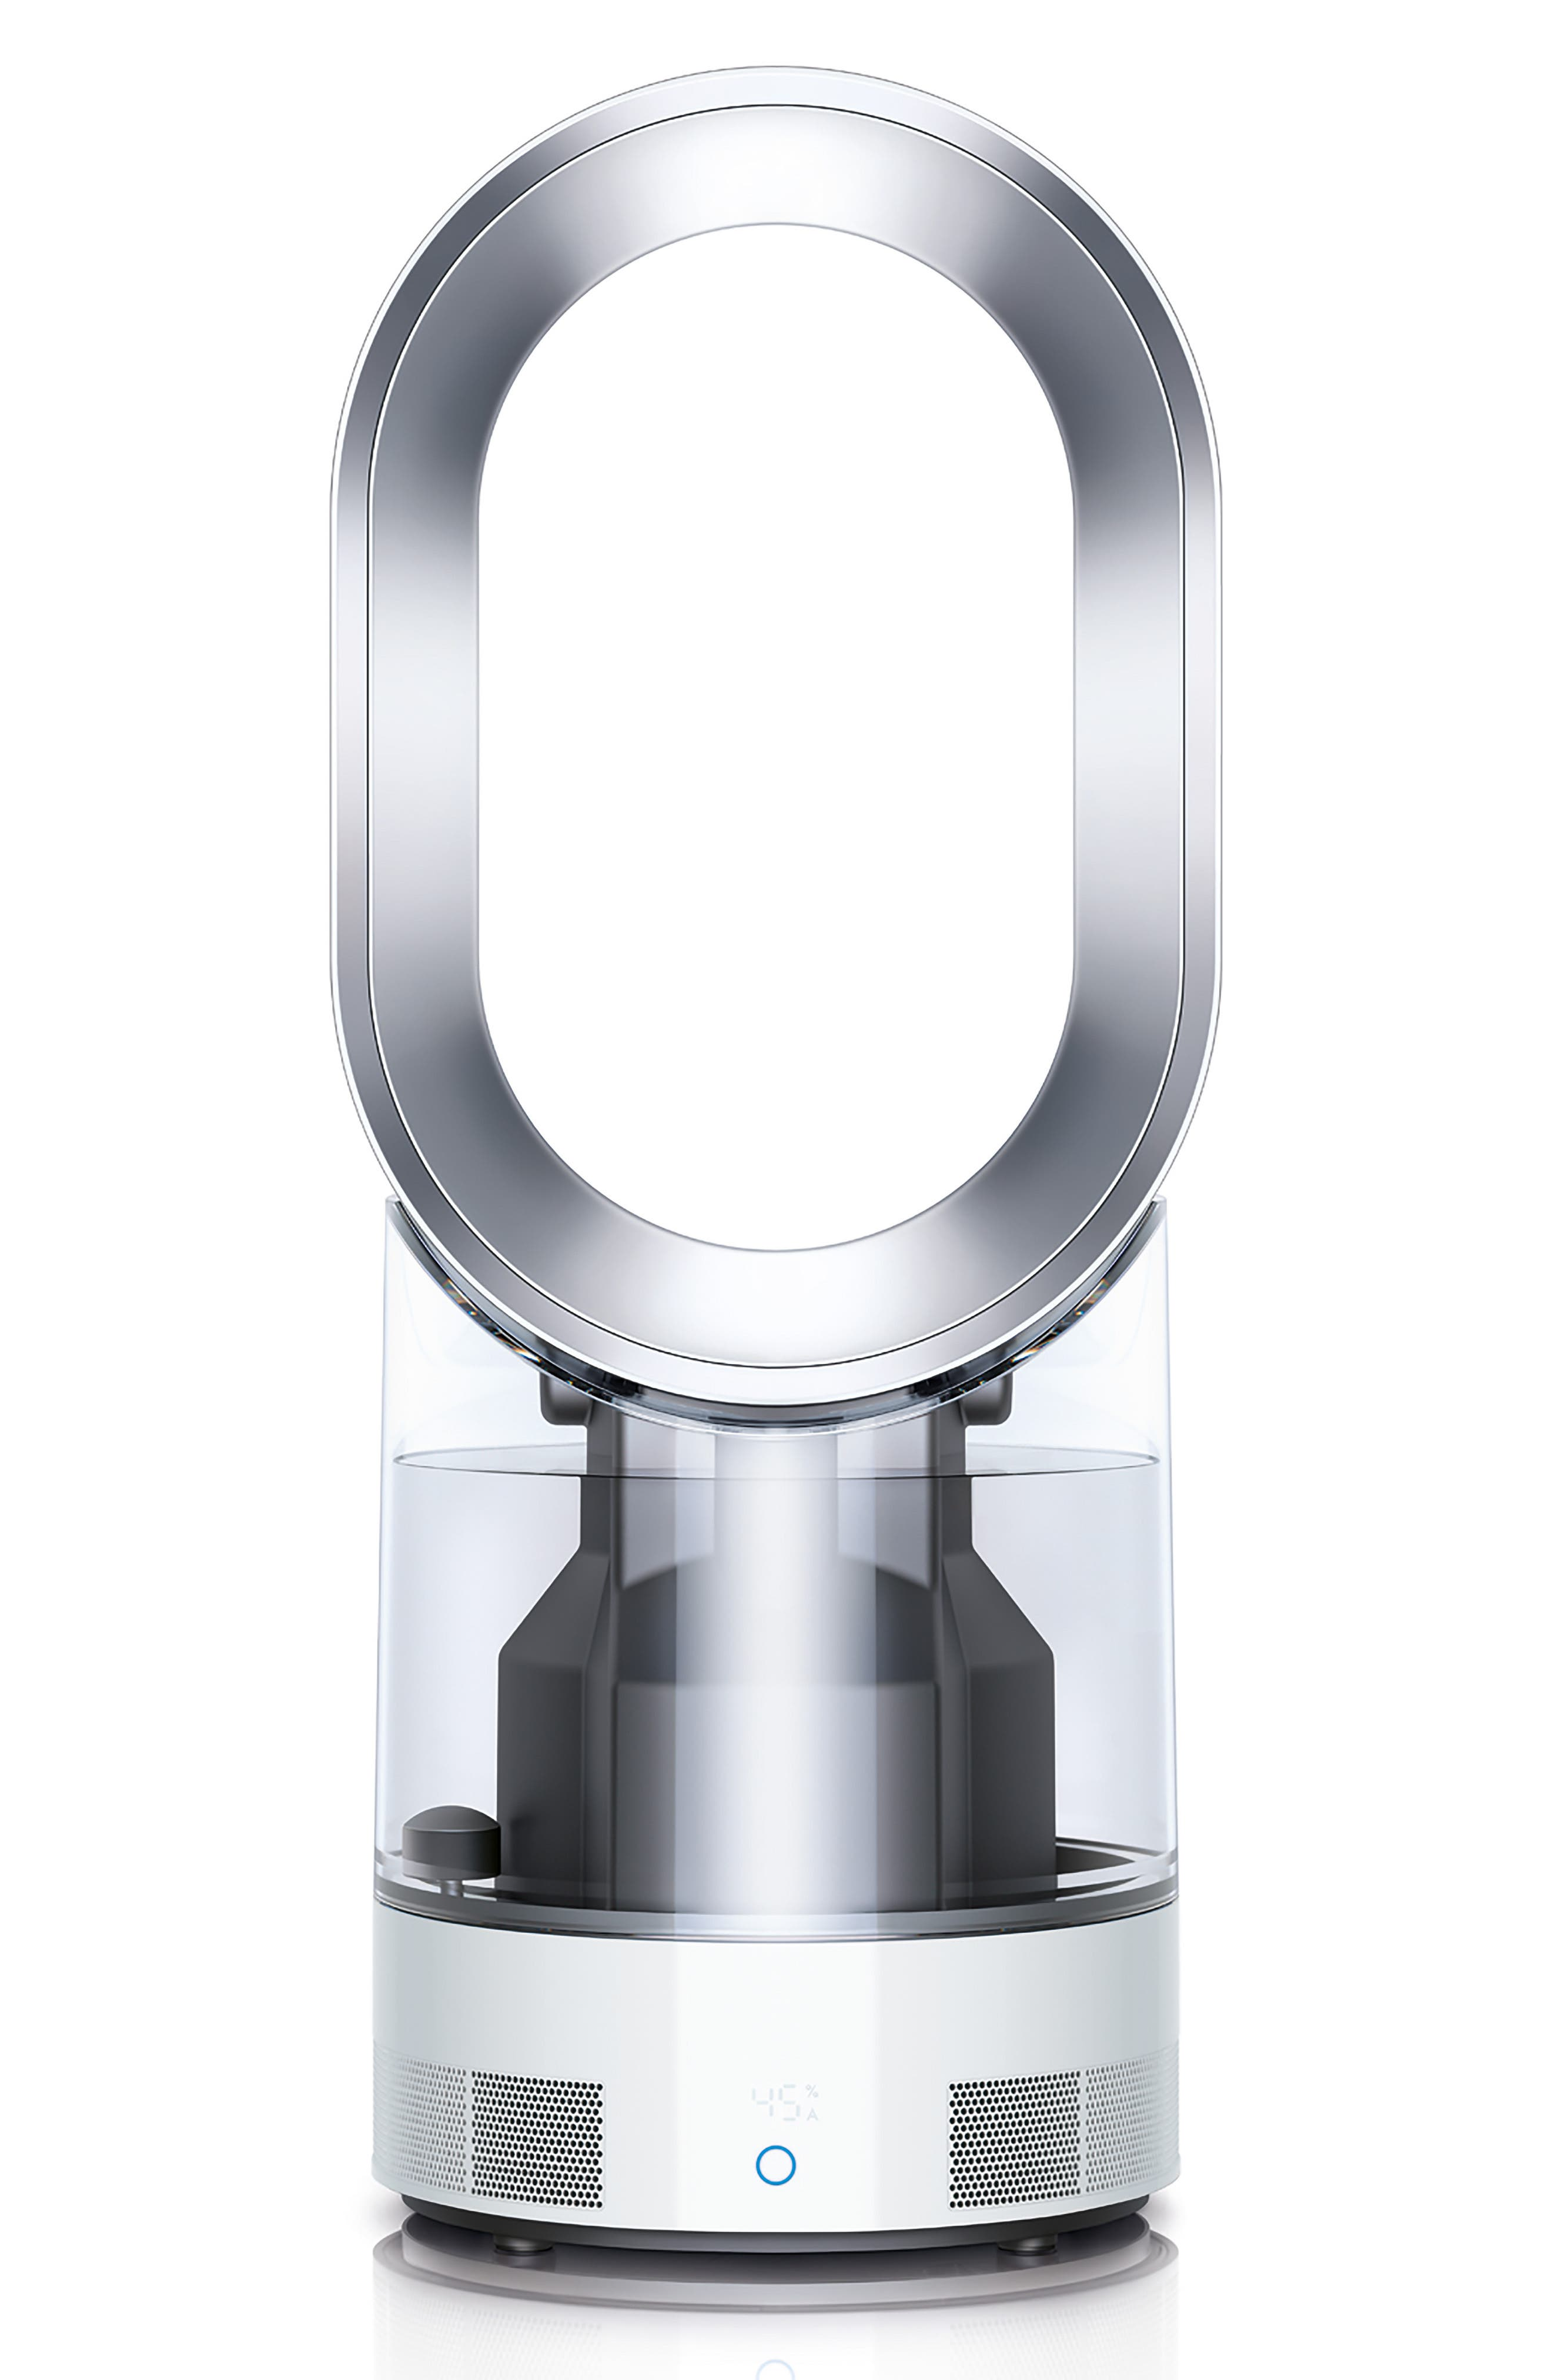 Alternate Image 1 Selected - Dyson AM10 Hygienic Humidifier & Bladeless Fan